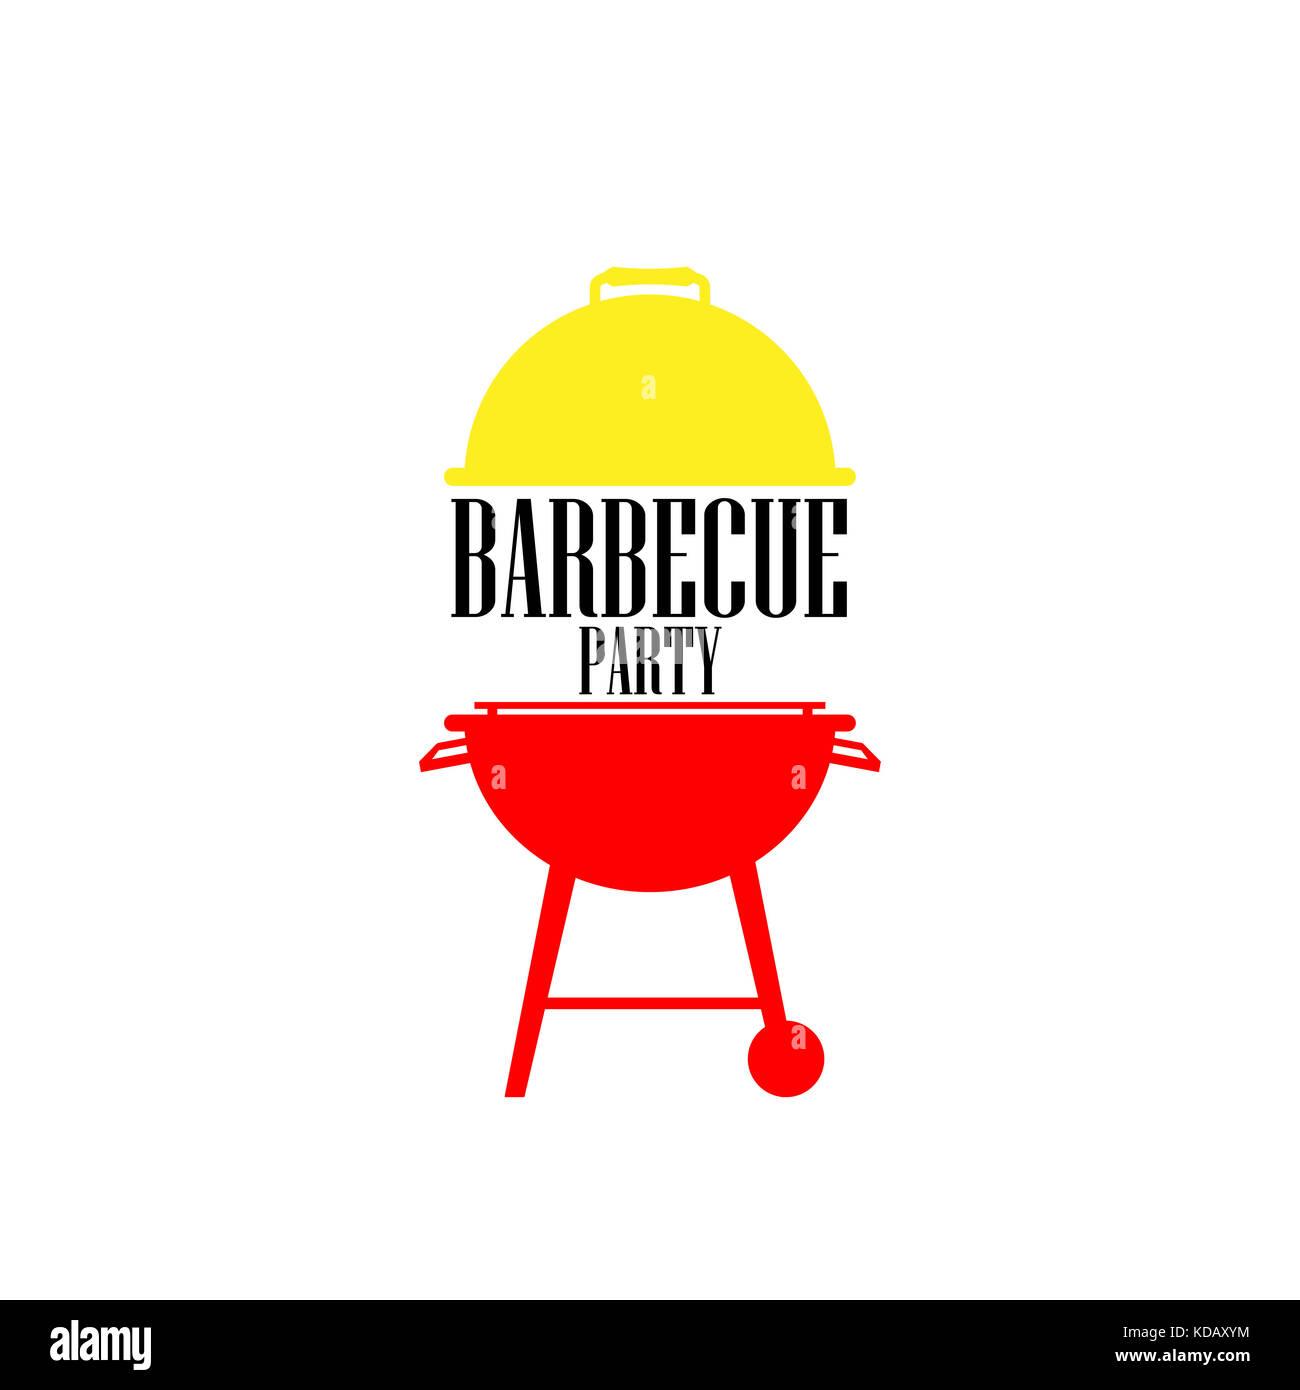 barbecue icon vector , barbecue party symbol - Stock Image